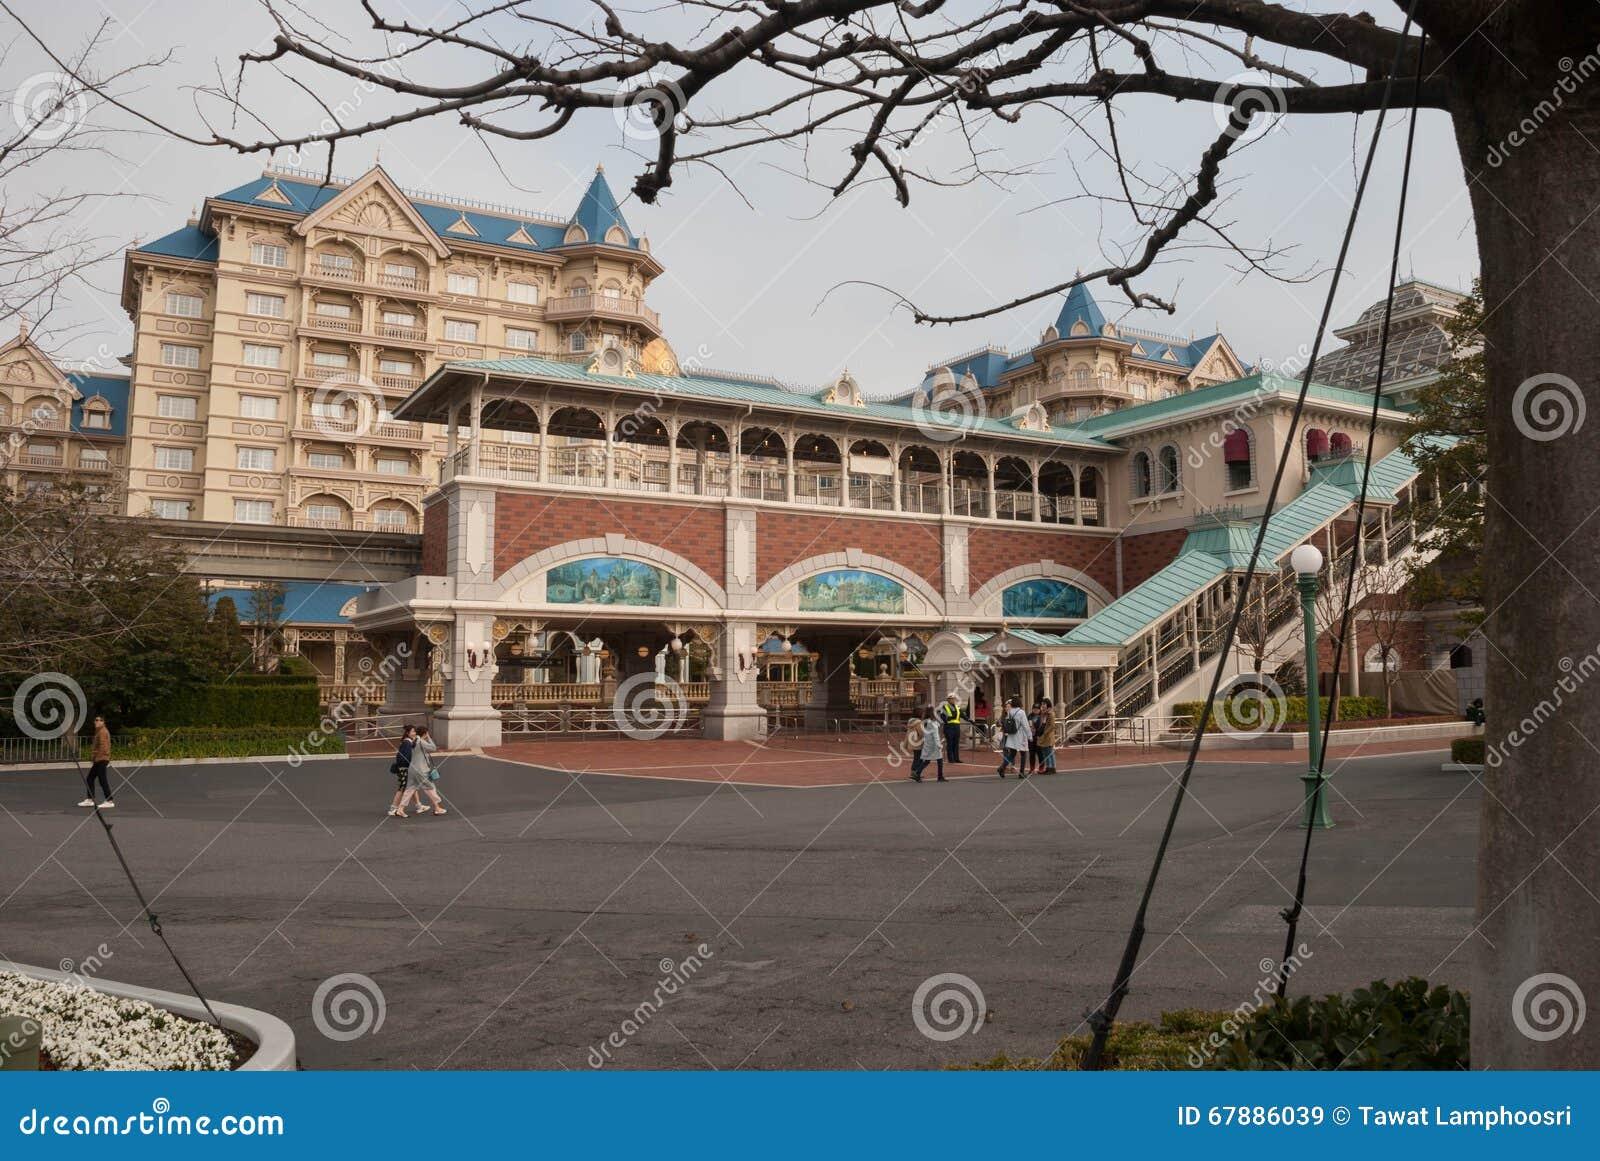 Stazione ferroviaria di Disneyland